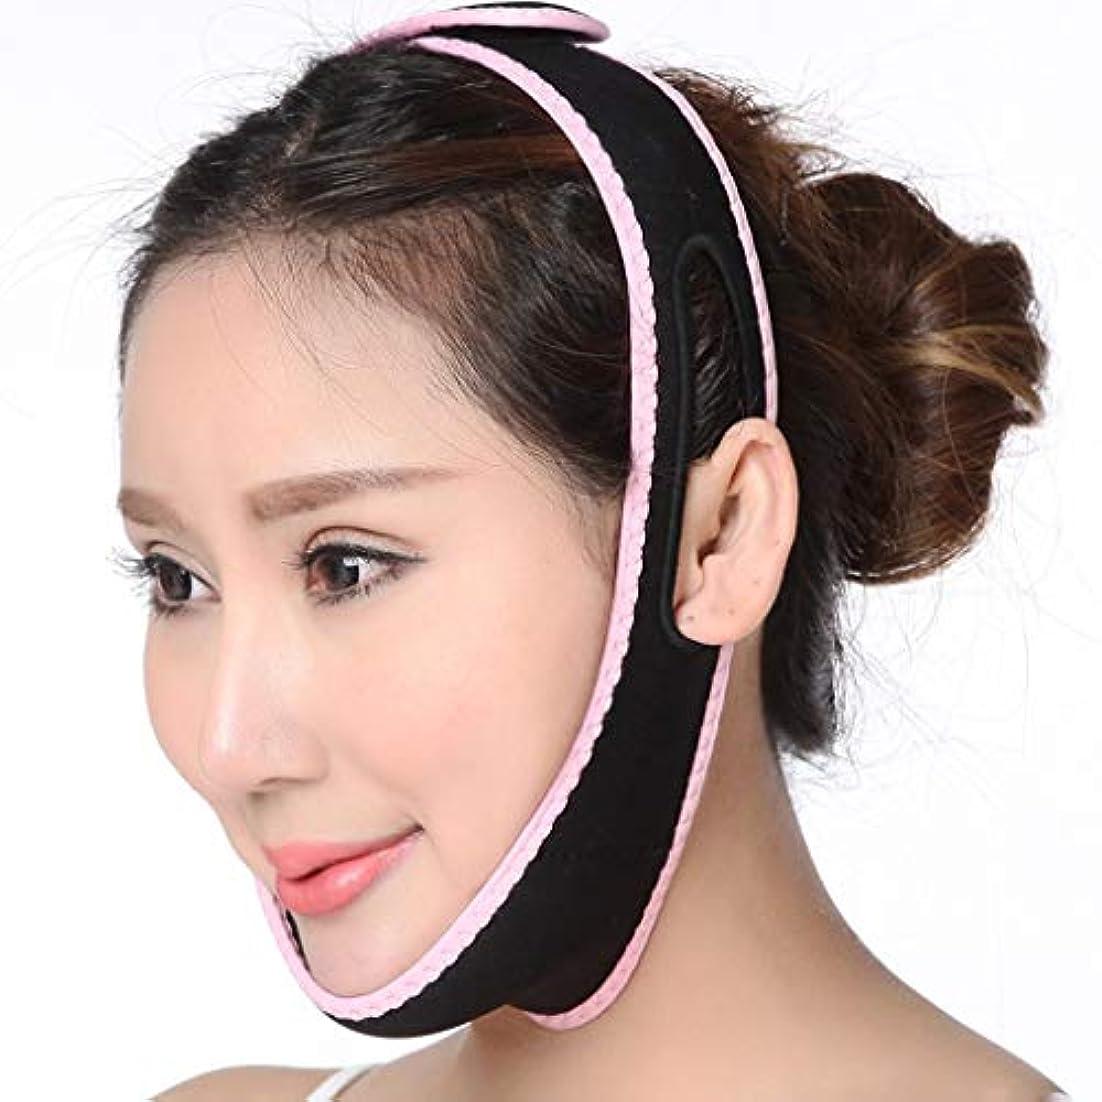 Jia He 軽量 薄い顔ベルト、スリープ薄い顔の包帯Vフェイスアーティファクト超薄型リフティングアンチリンクル二重あご通気性ビームフェイスベルト ## (Color : Black and Pink)